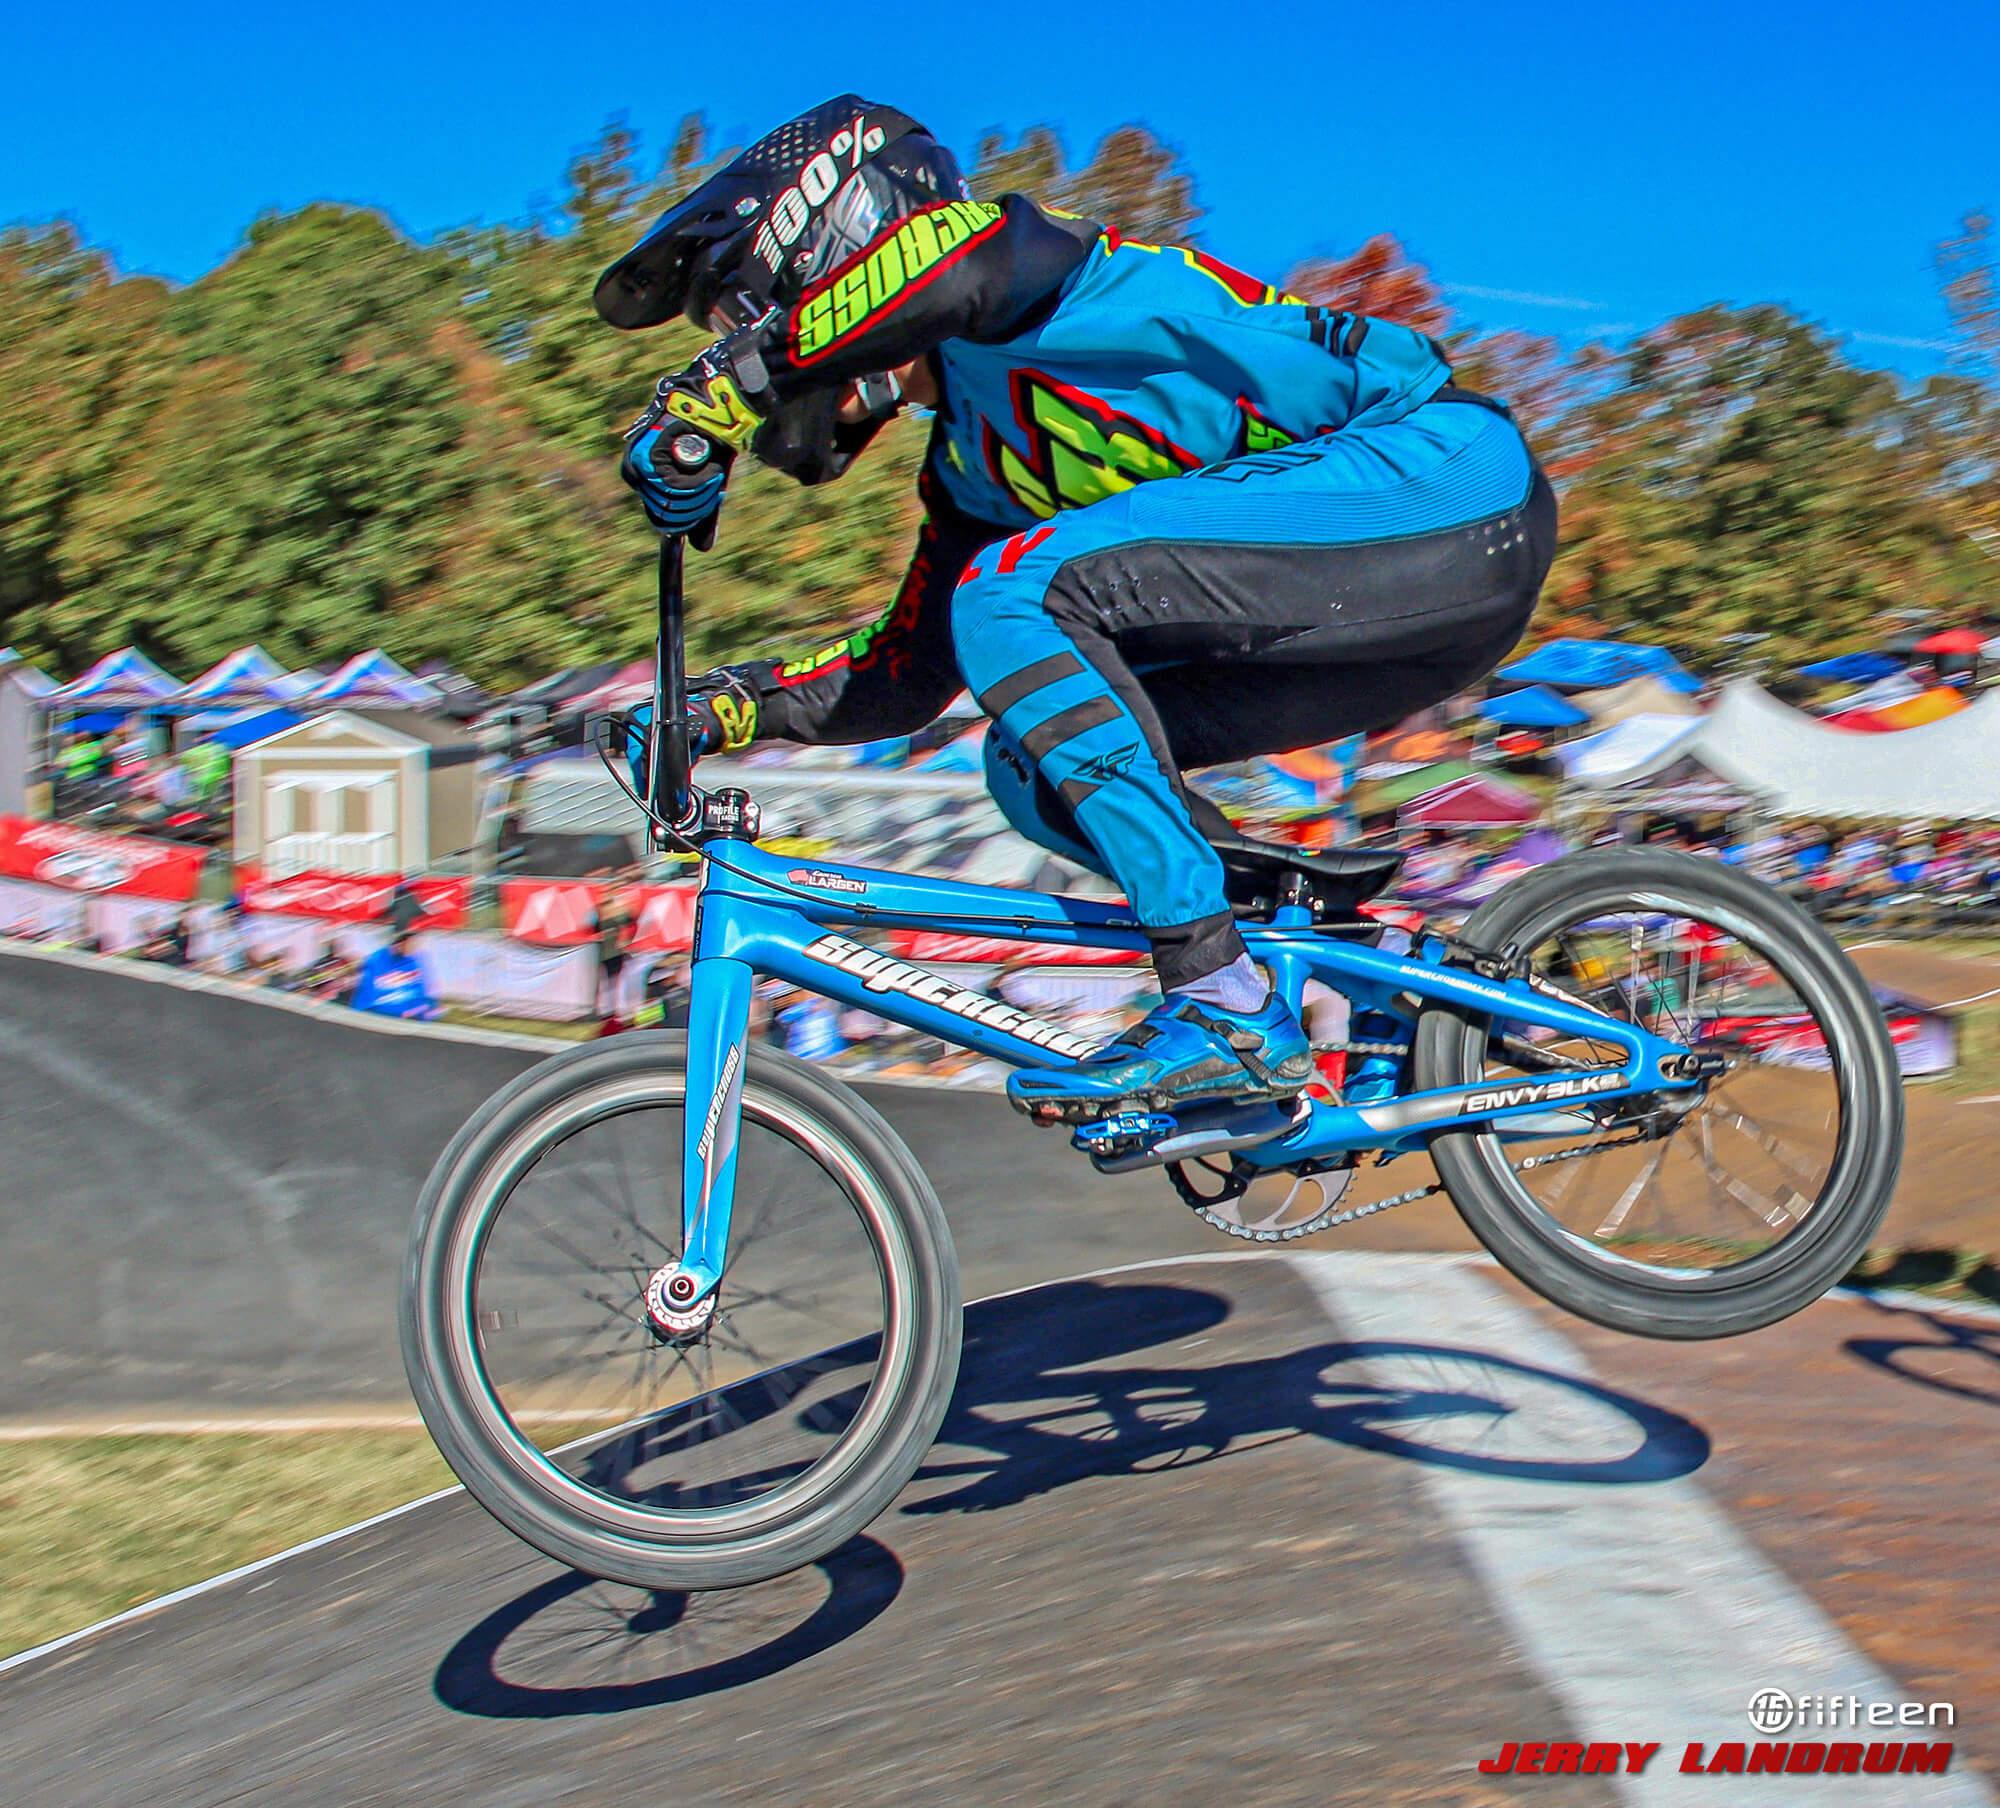 USA BMX Derby City 2020 - Jerry Landrum - 0141-2000FX